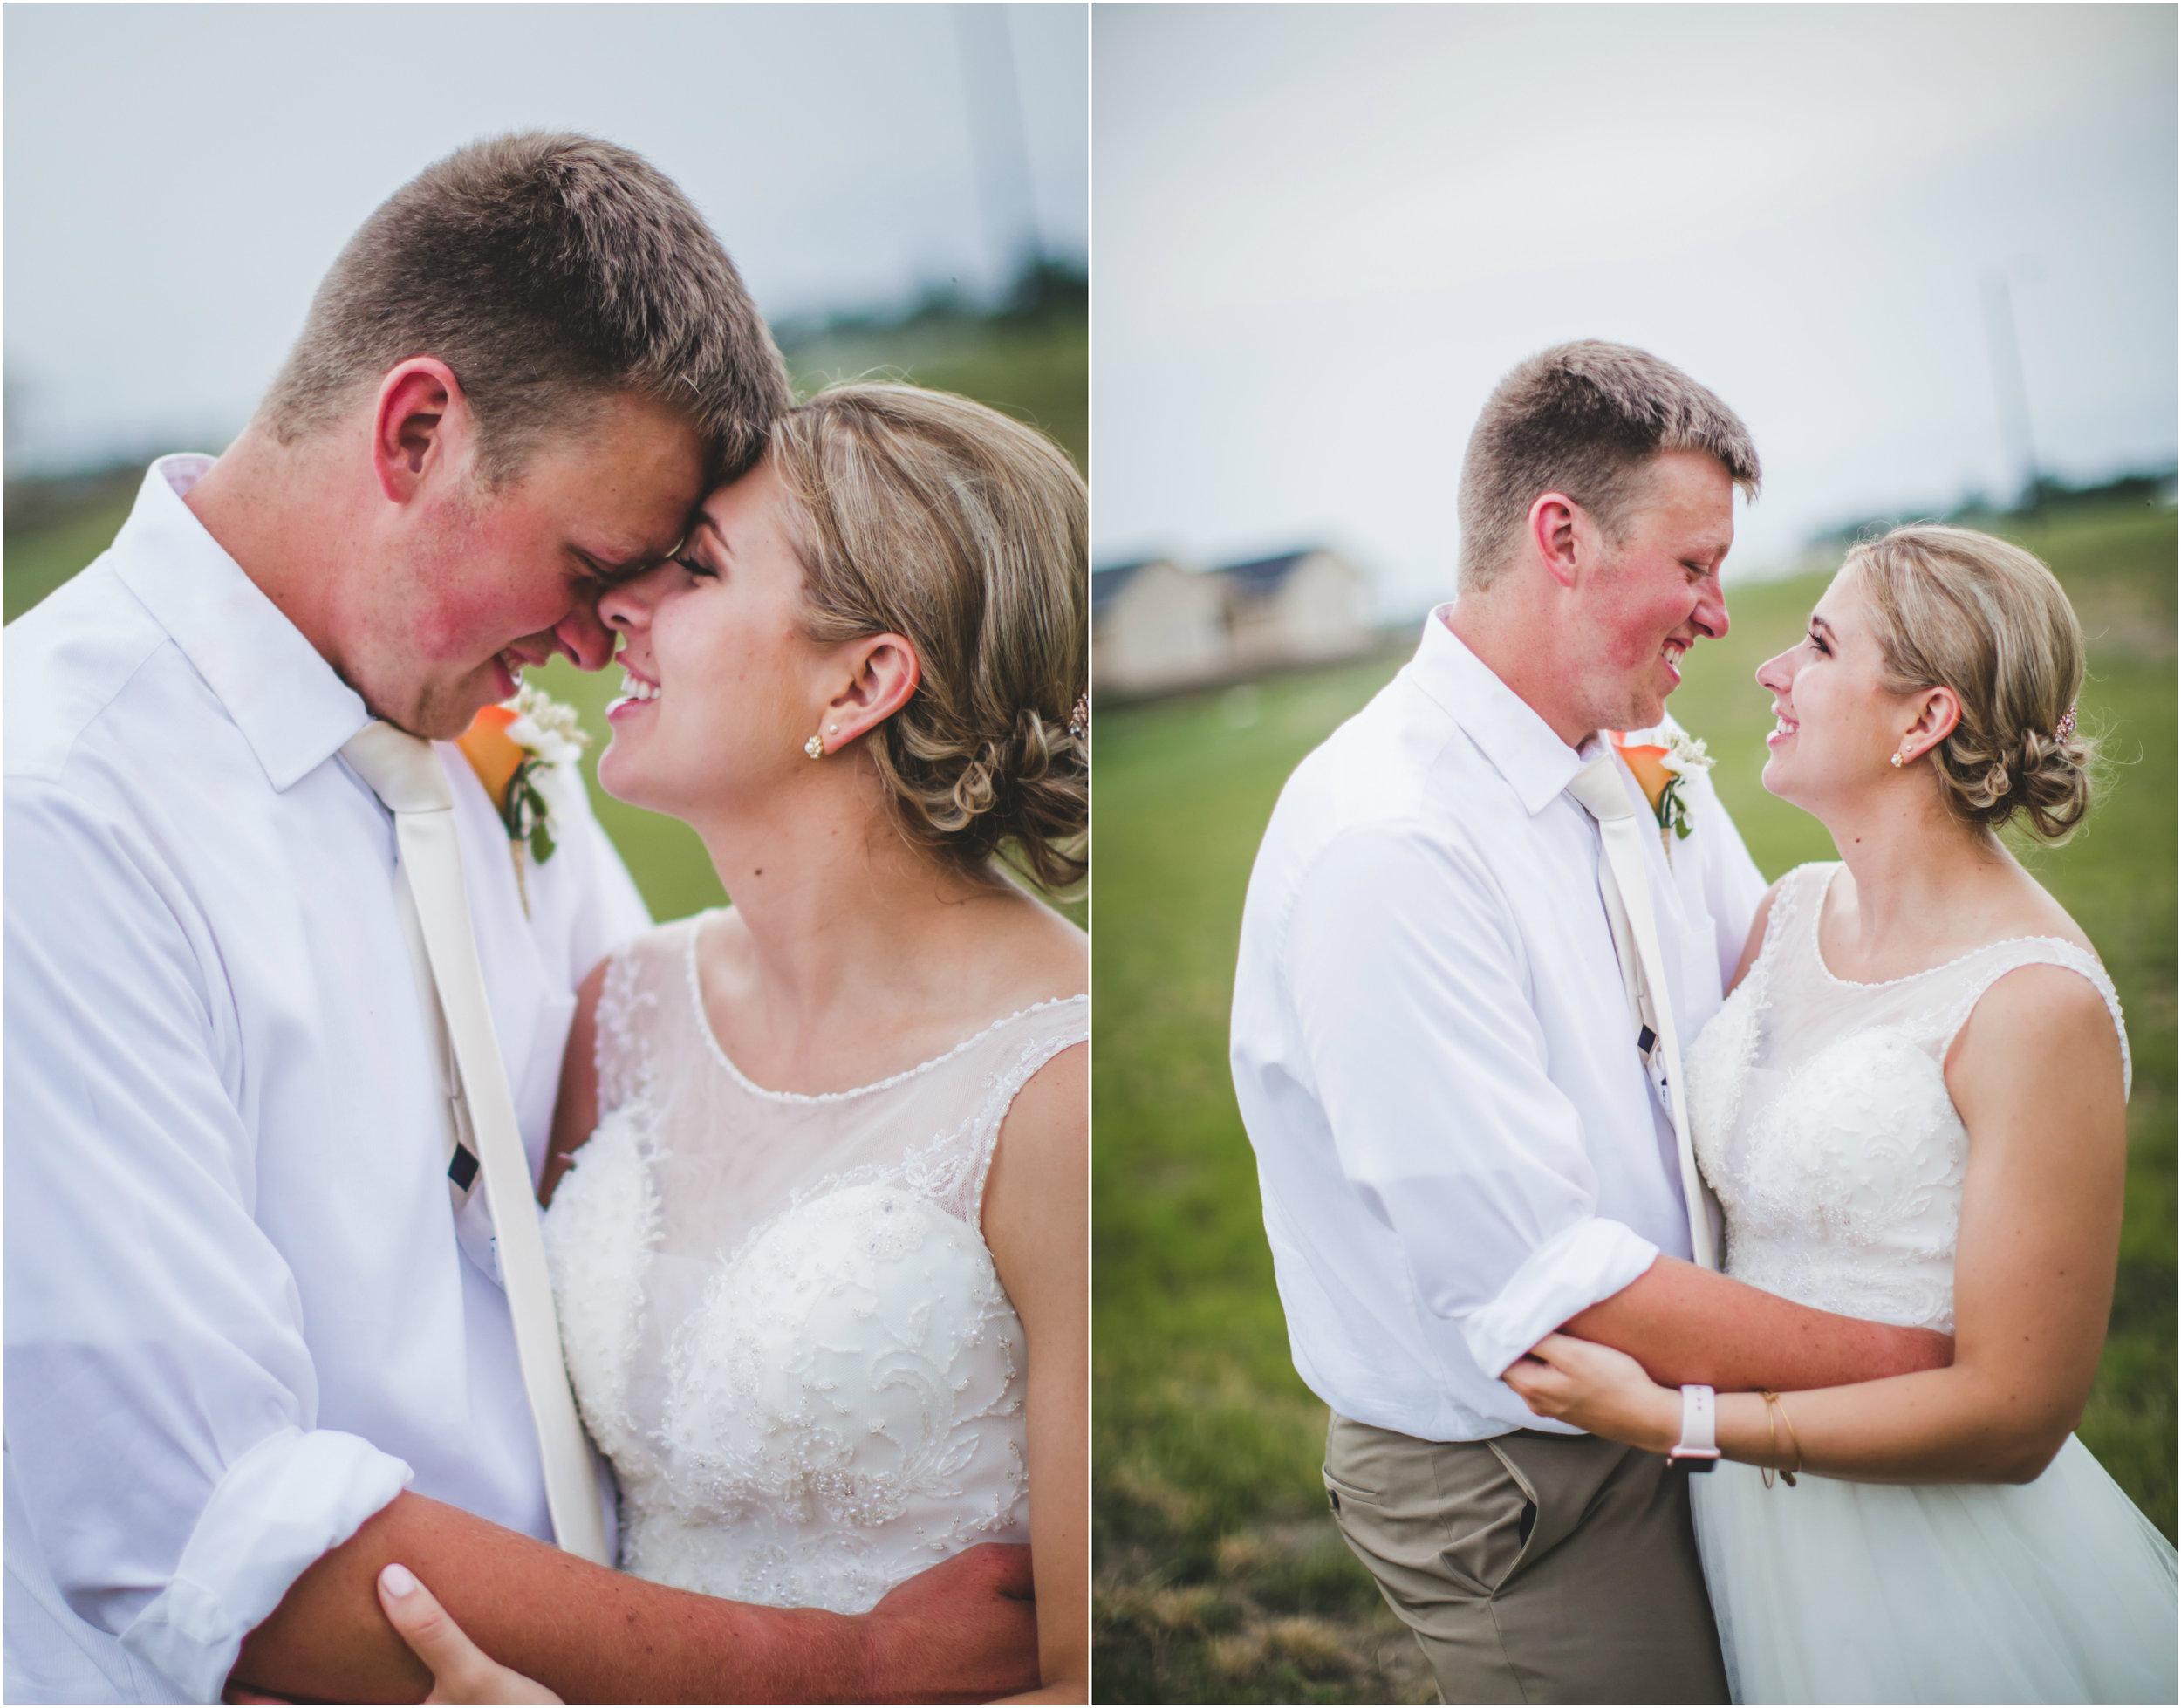 Harrisberg South Dakota Wedding1.jpg